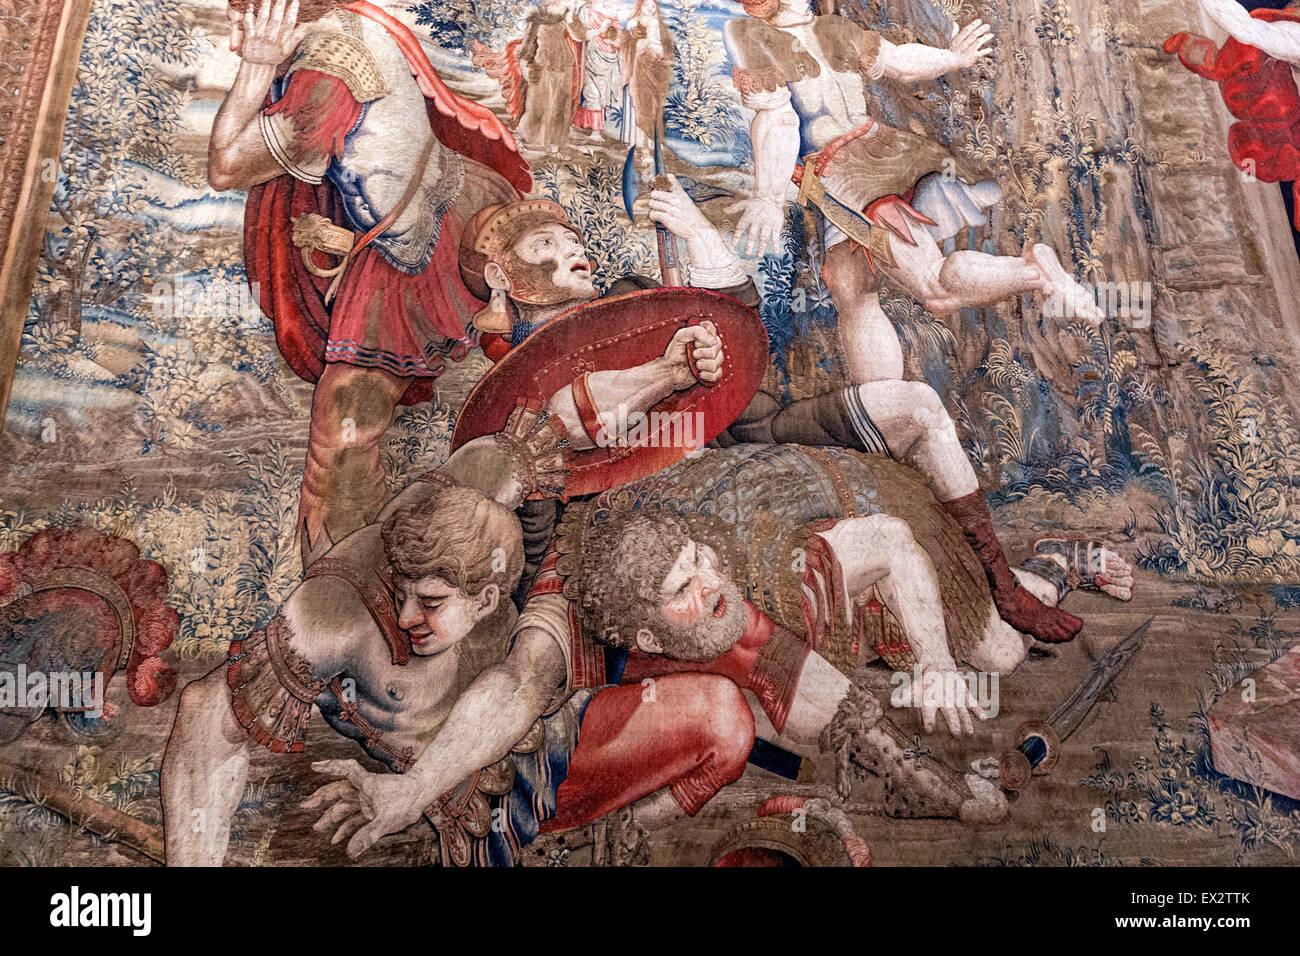 Detail of La Résurrection du Christ Tapestry - Galleria degli Arazzi. Vatican Museums, Musei Vaticani, Vatican City. Stock Photo